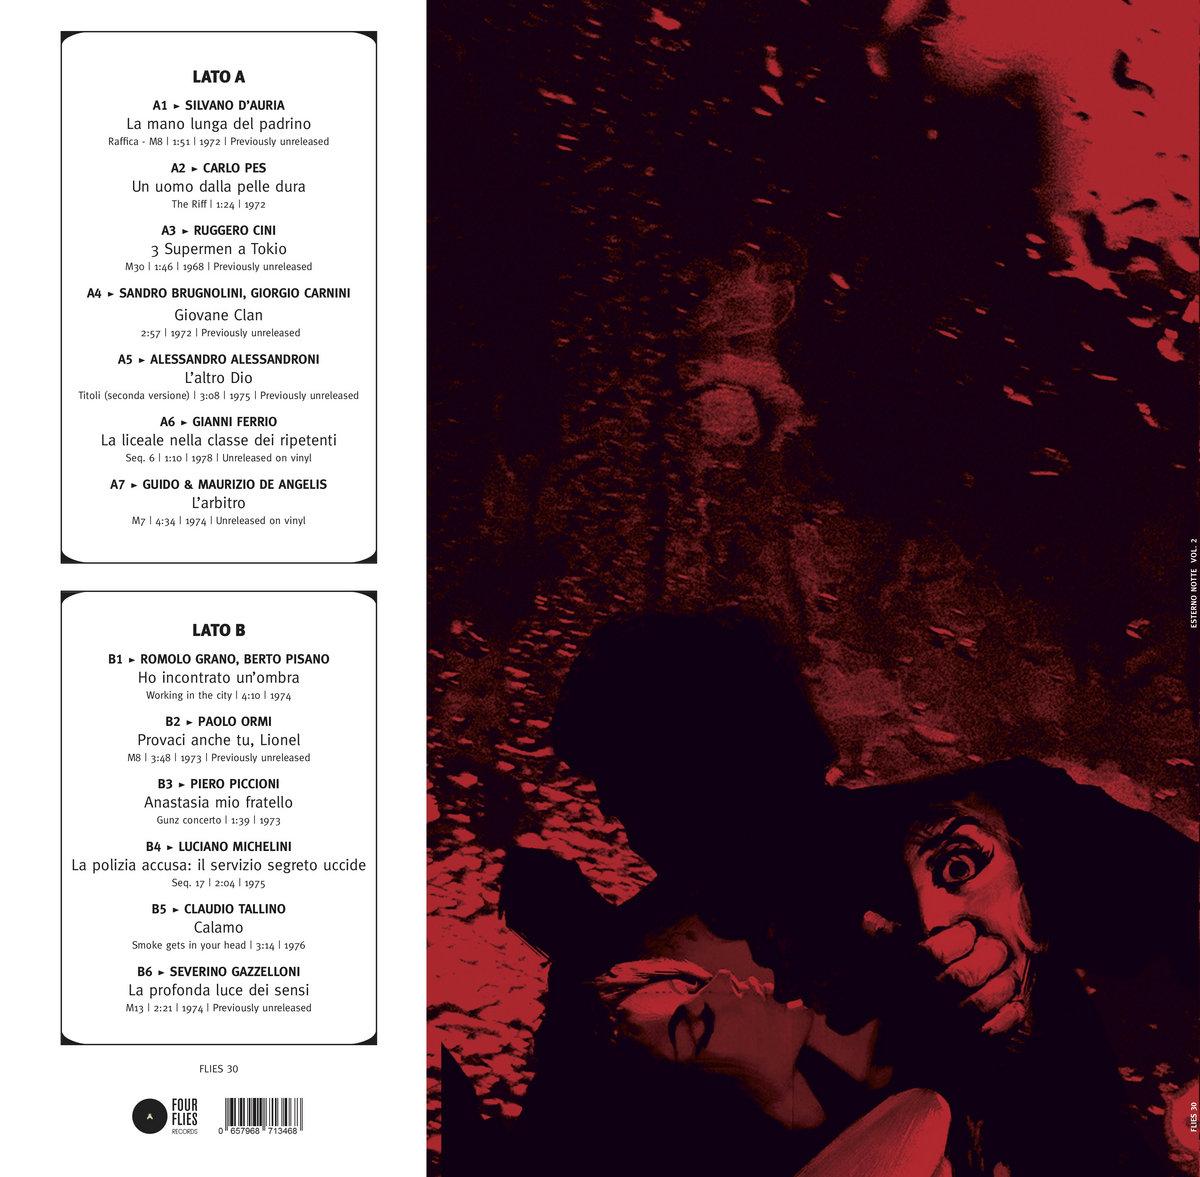 ESTERNO NOTTE VOL  2 | Four Flies Records